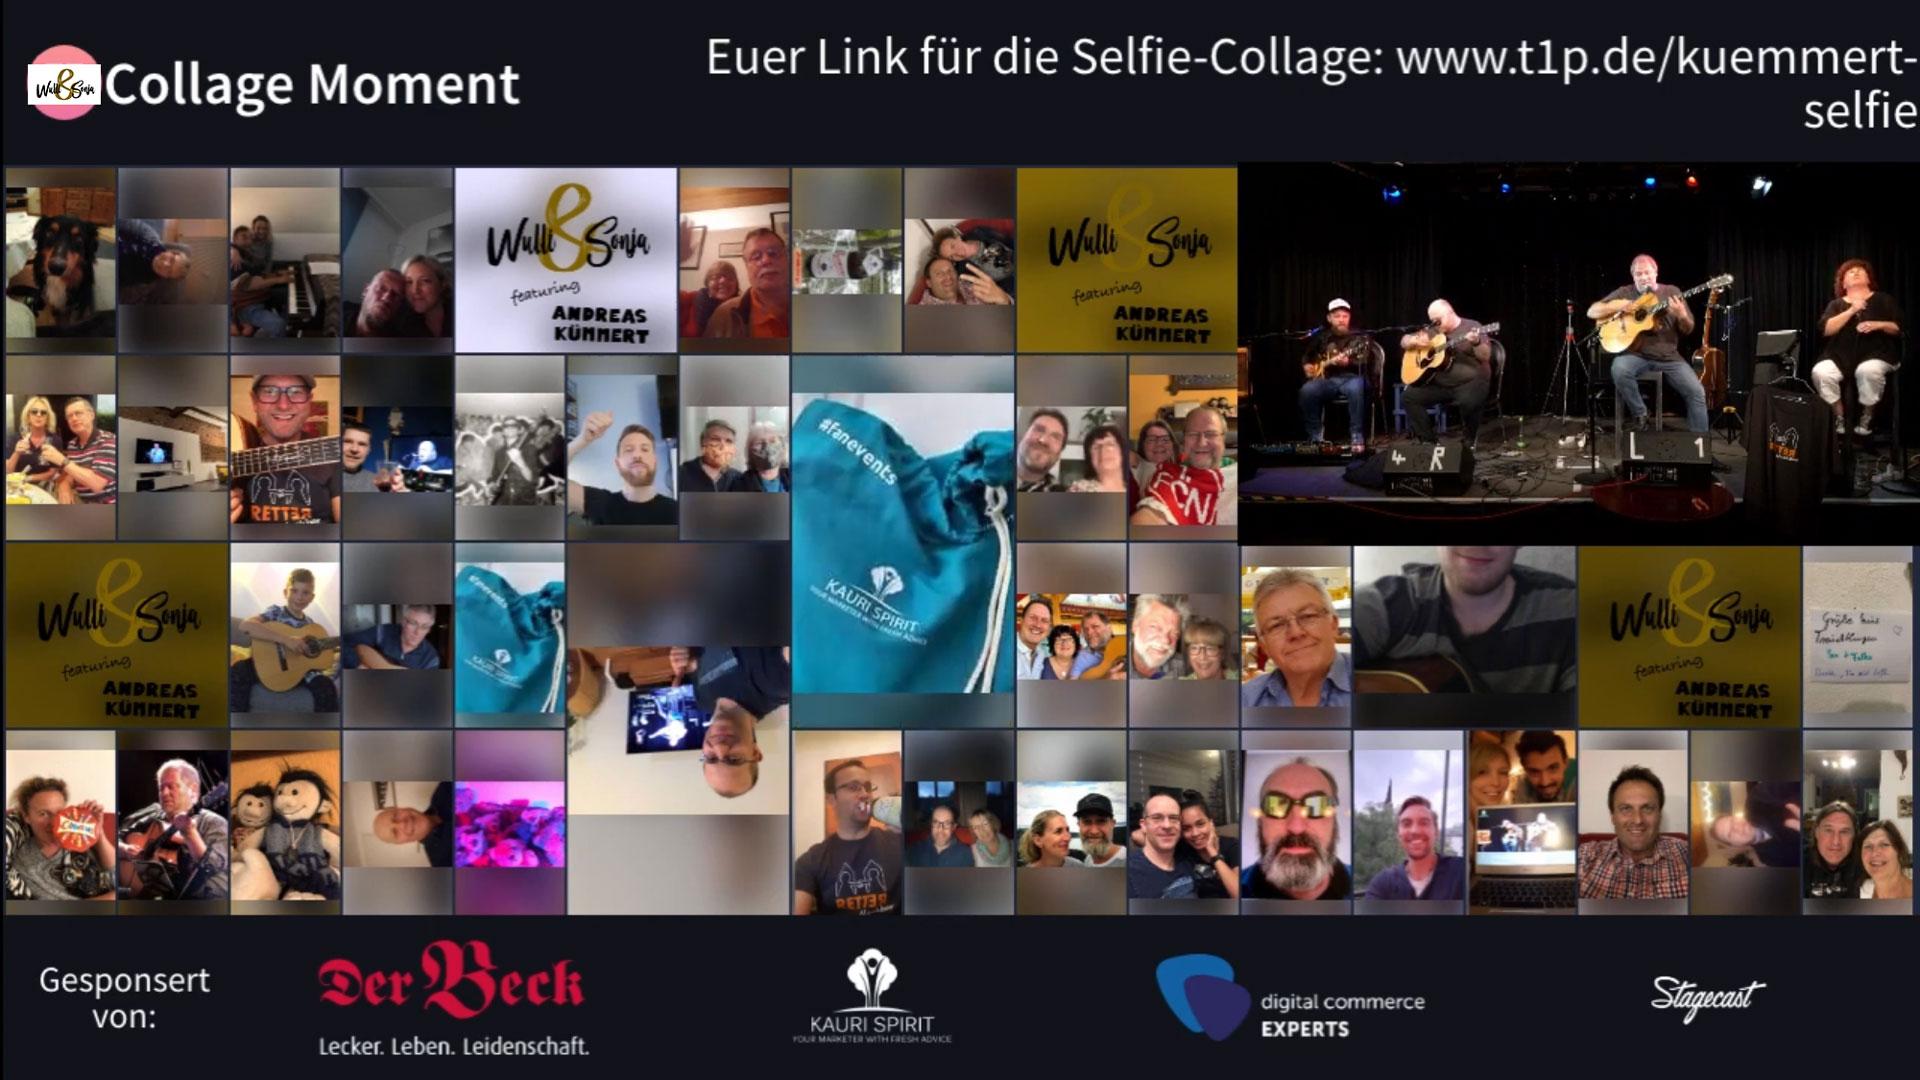 Kauri Spirit Wulli und Sonja Andreas Kümmert Konzert Stagecast 2020